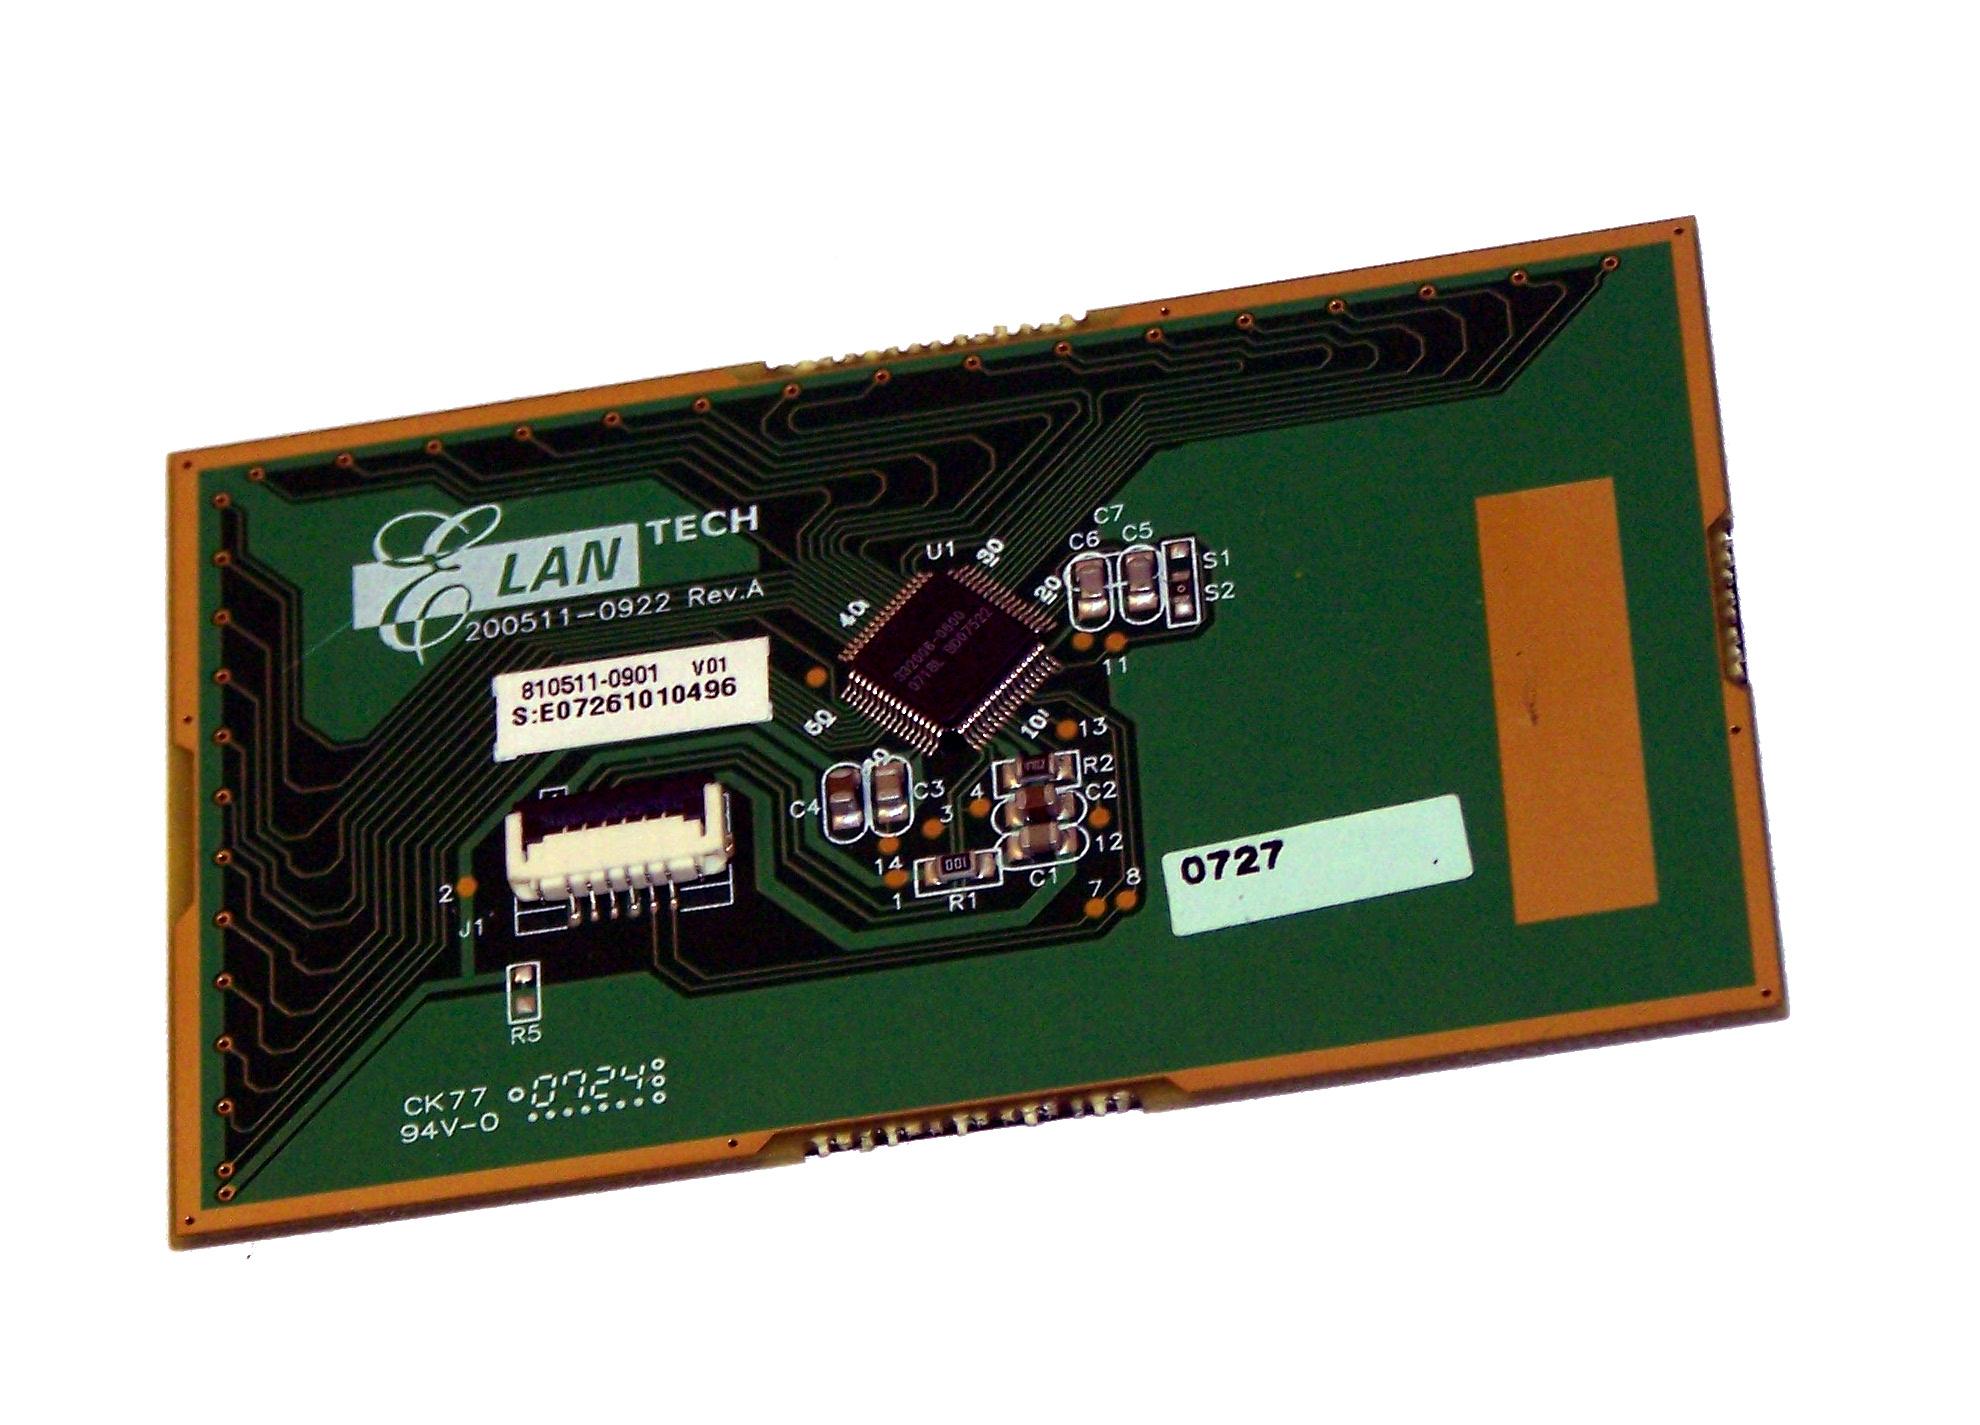 RM EL81 WINDOWS 7 X64 TREIBER